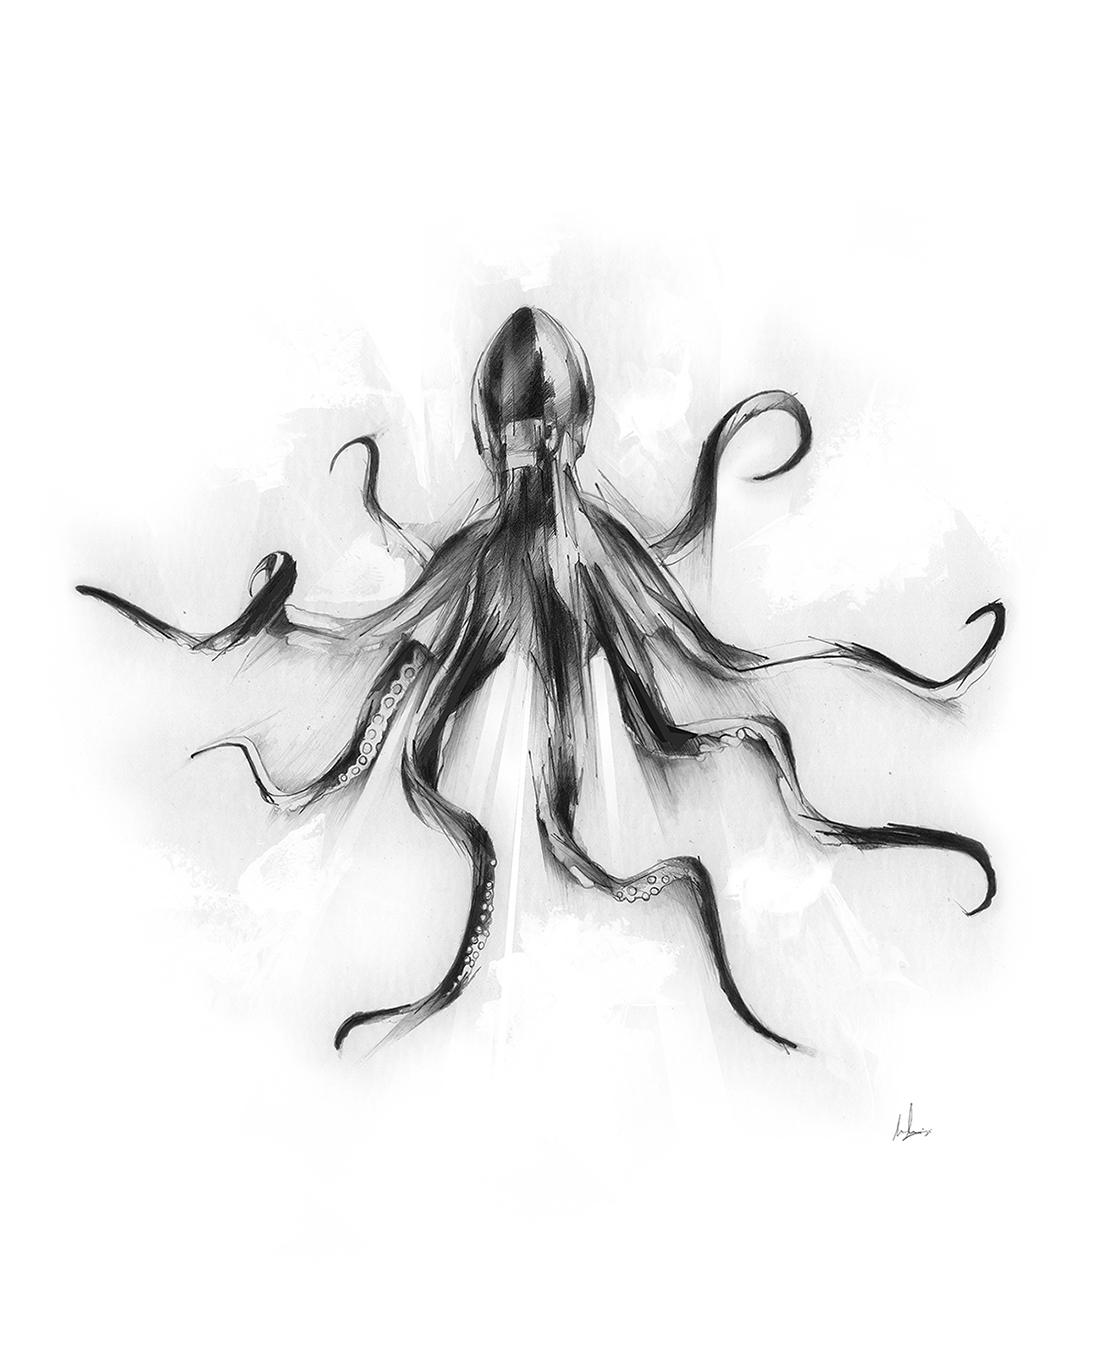 King octopus - alexismarcou | ello